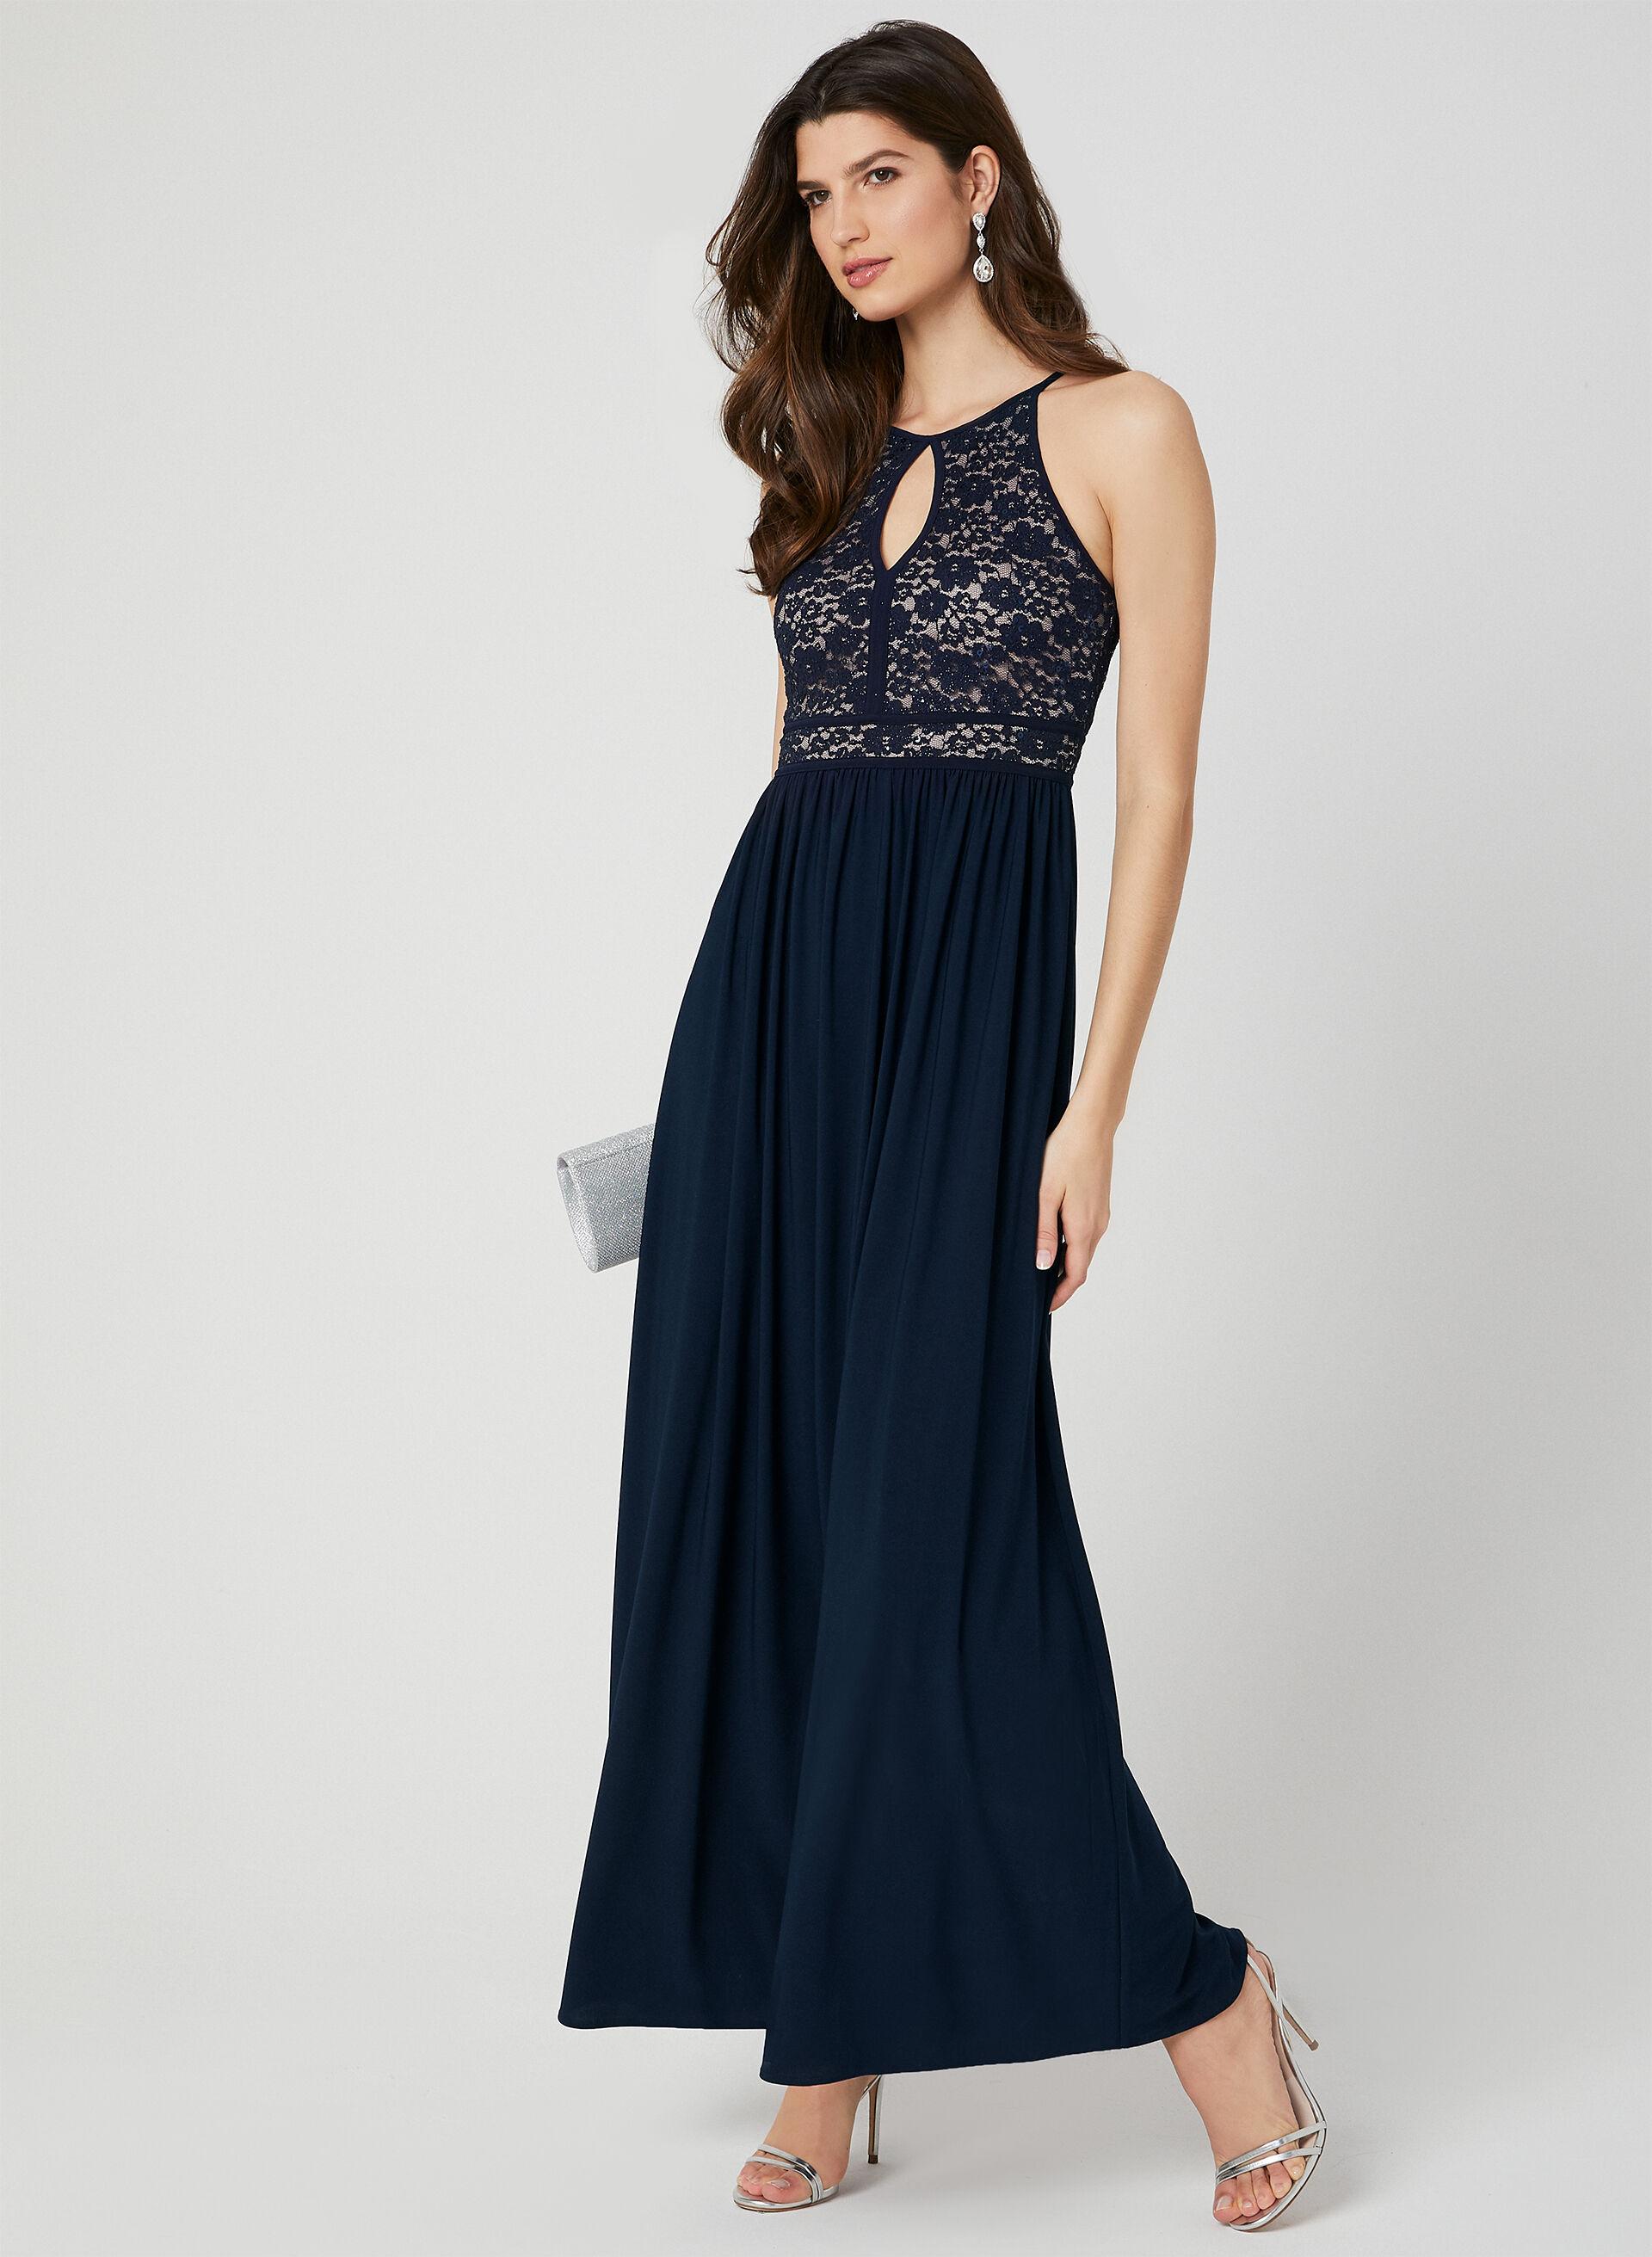 Good Christian Prom Dresses